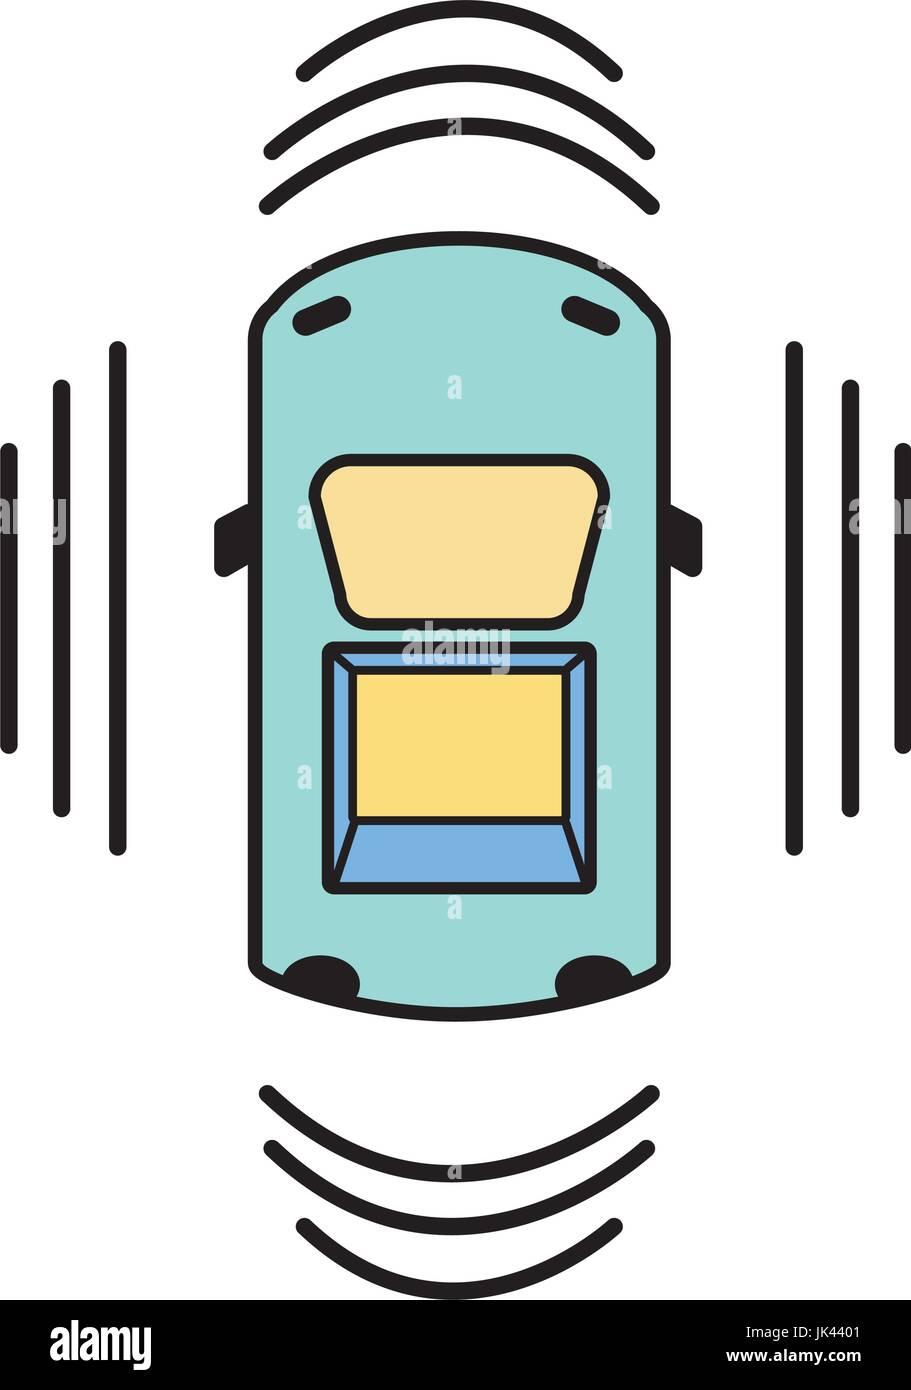 car transportation from above with sunroof stock vector art rh alamy com Ice Cream Sandwich Clip Art Remote Start Clip Art